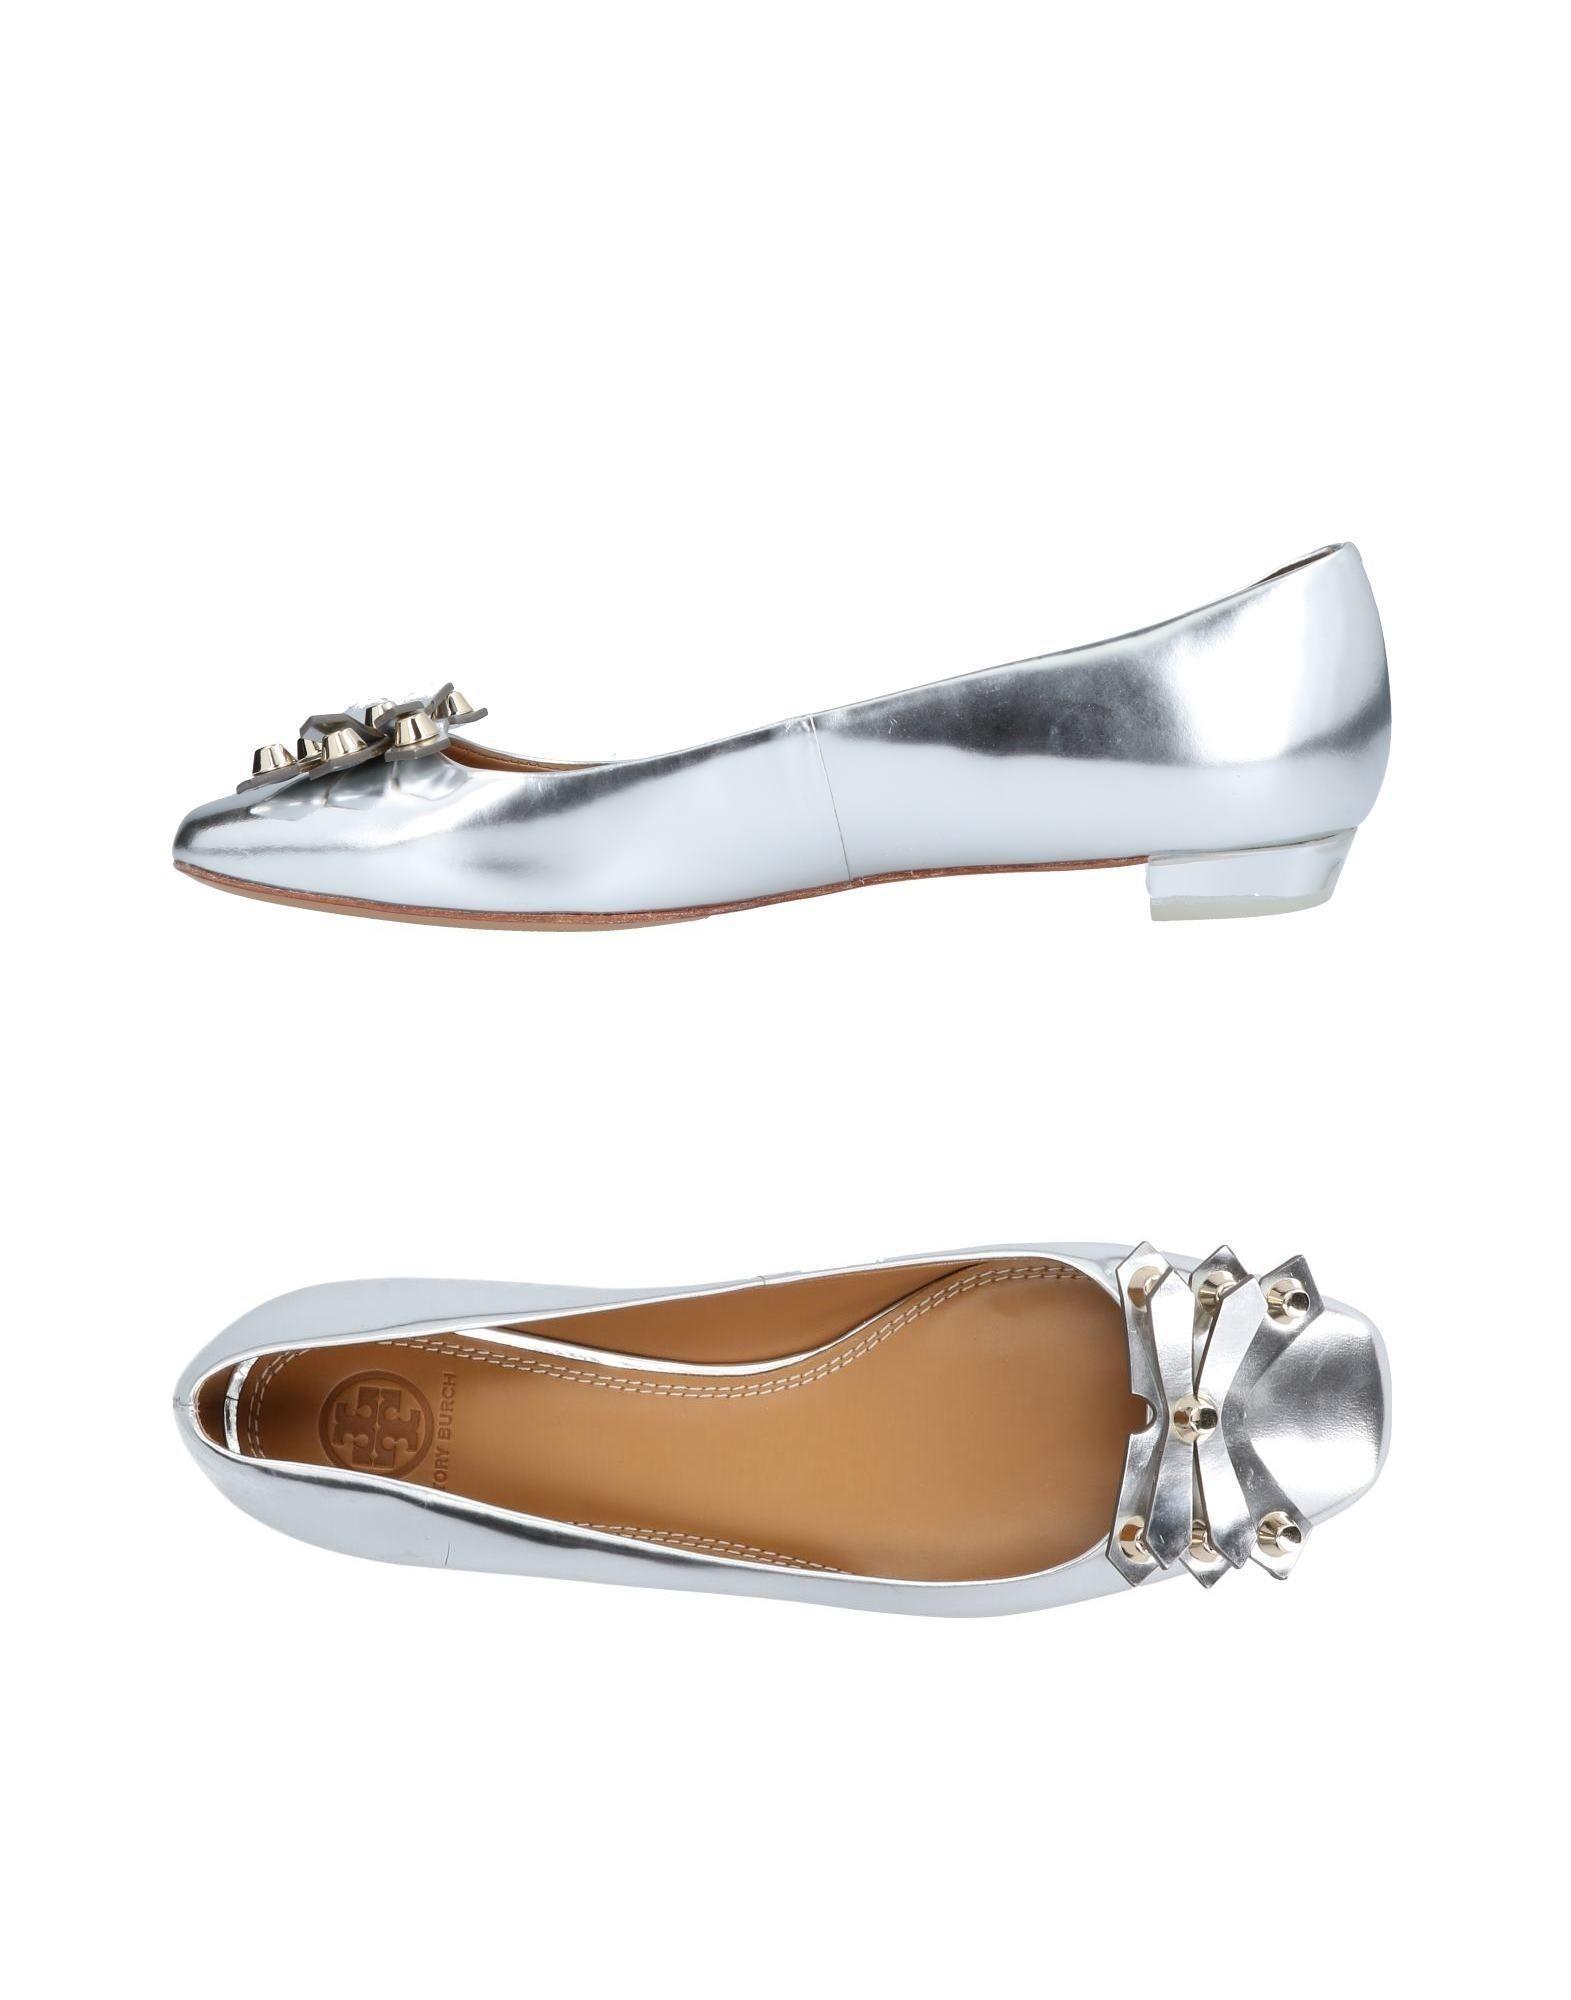 Tory Burch Ballet Flats In Silver